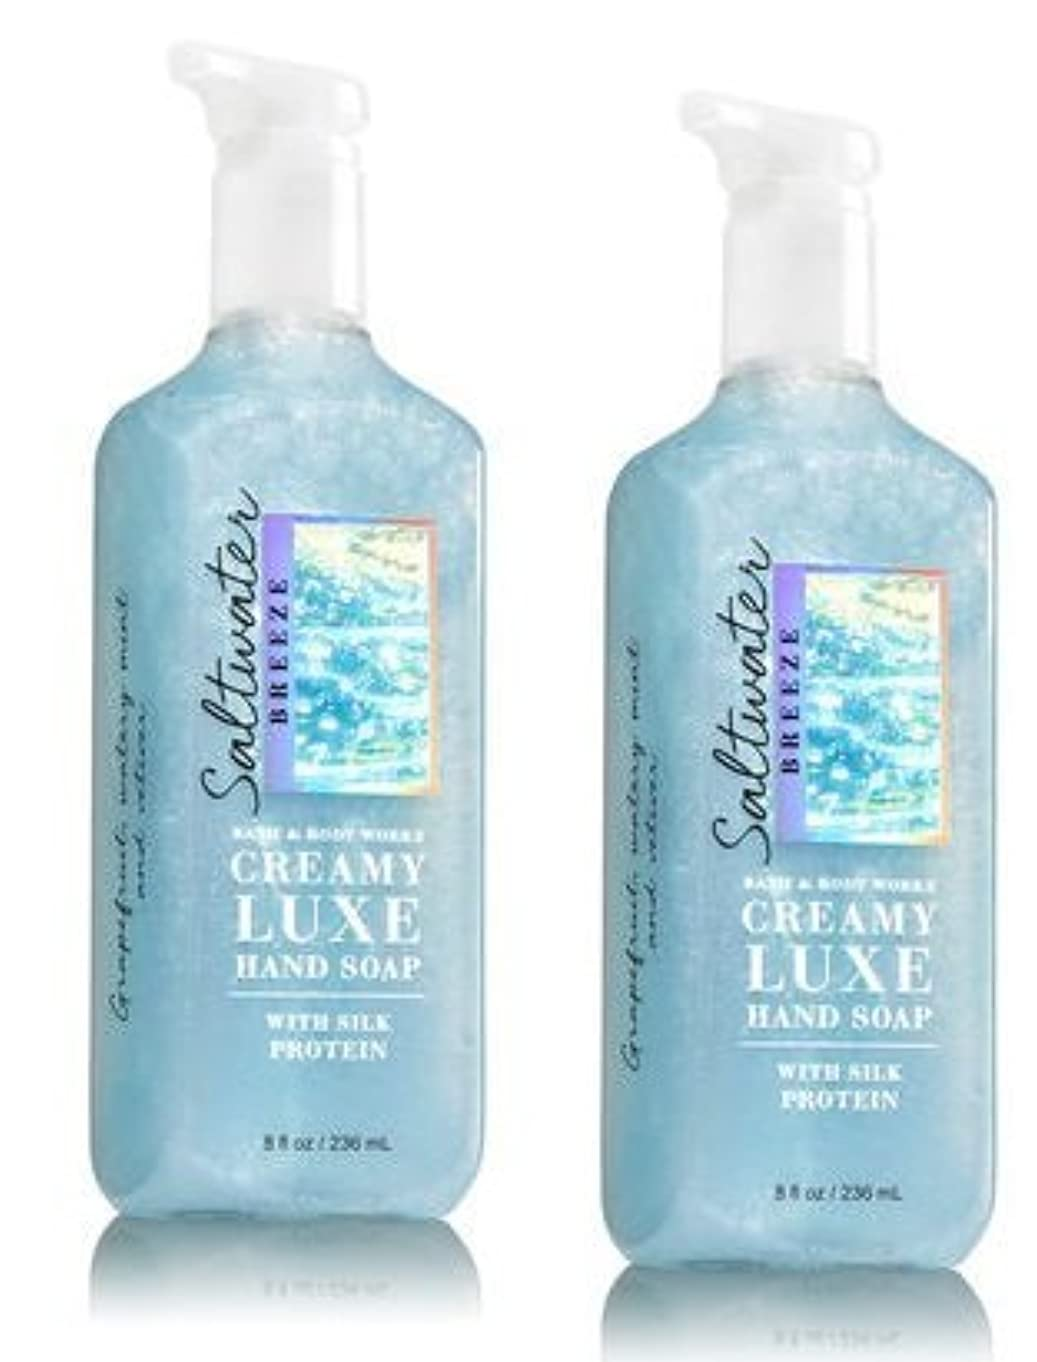 Bath & Body Works ソルトウォーターブリーズ クリーミー リュクス ハンドソープ 2本セット SALTWATER BREEZE Creamy Luxe Hand Soap. 8 oz 236ml [並行輸入品]